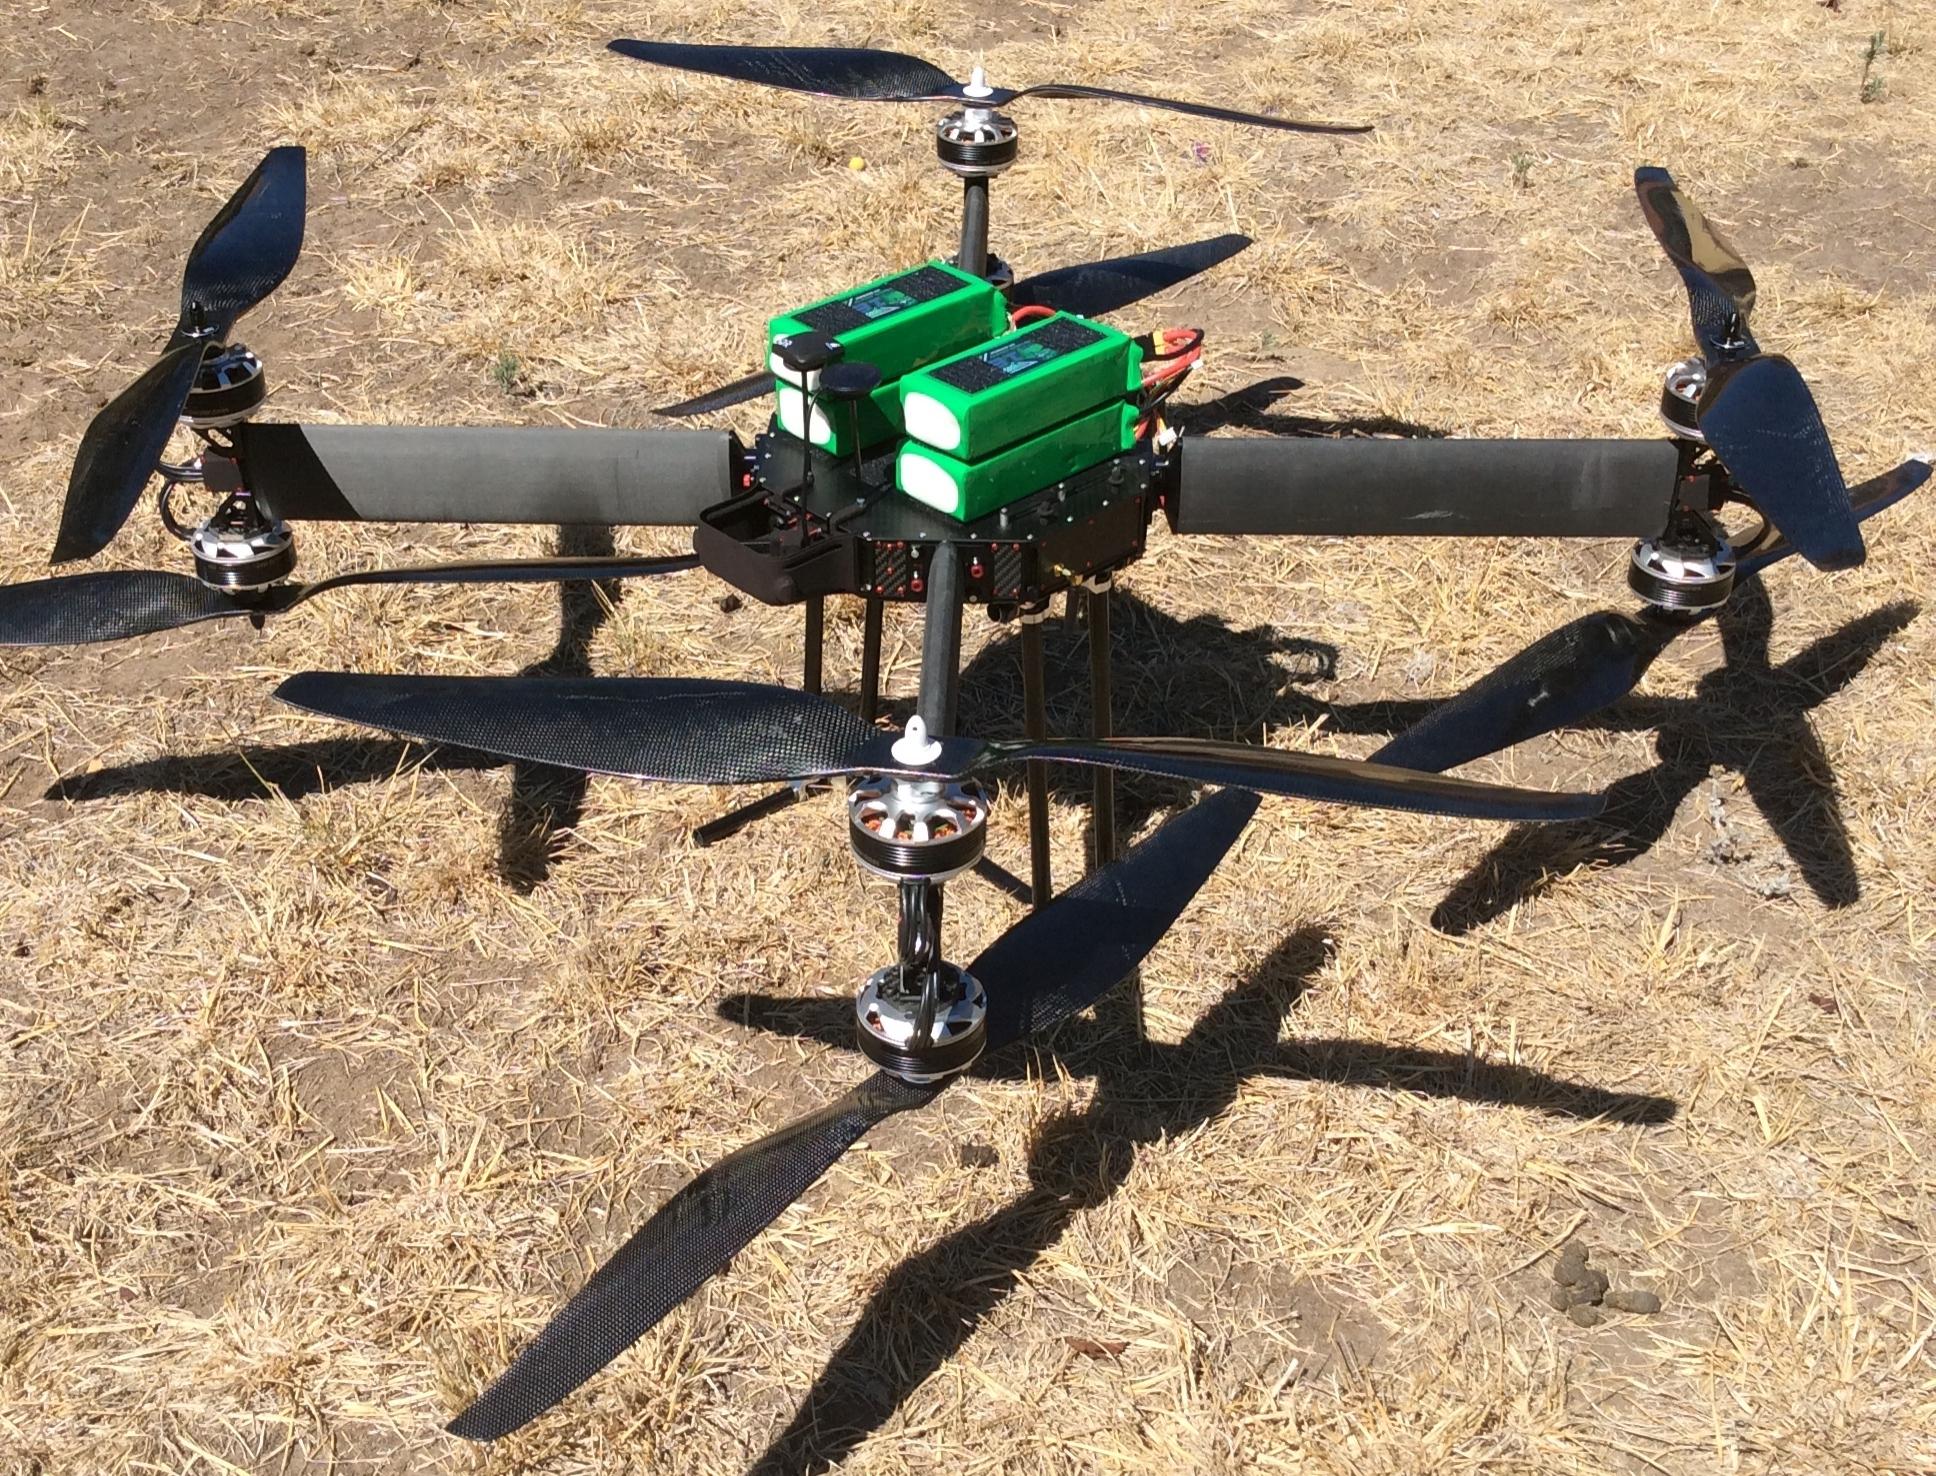 Vector R30: Built for demanding environments